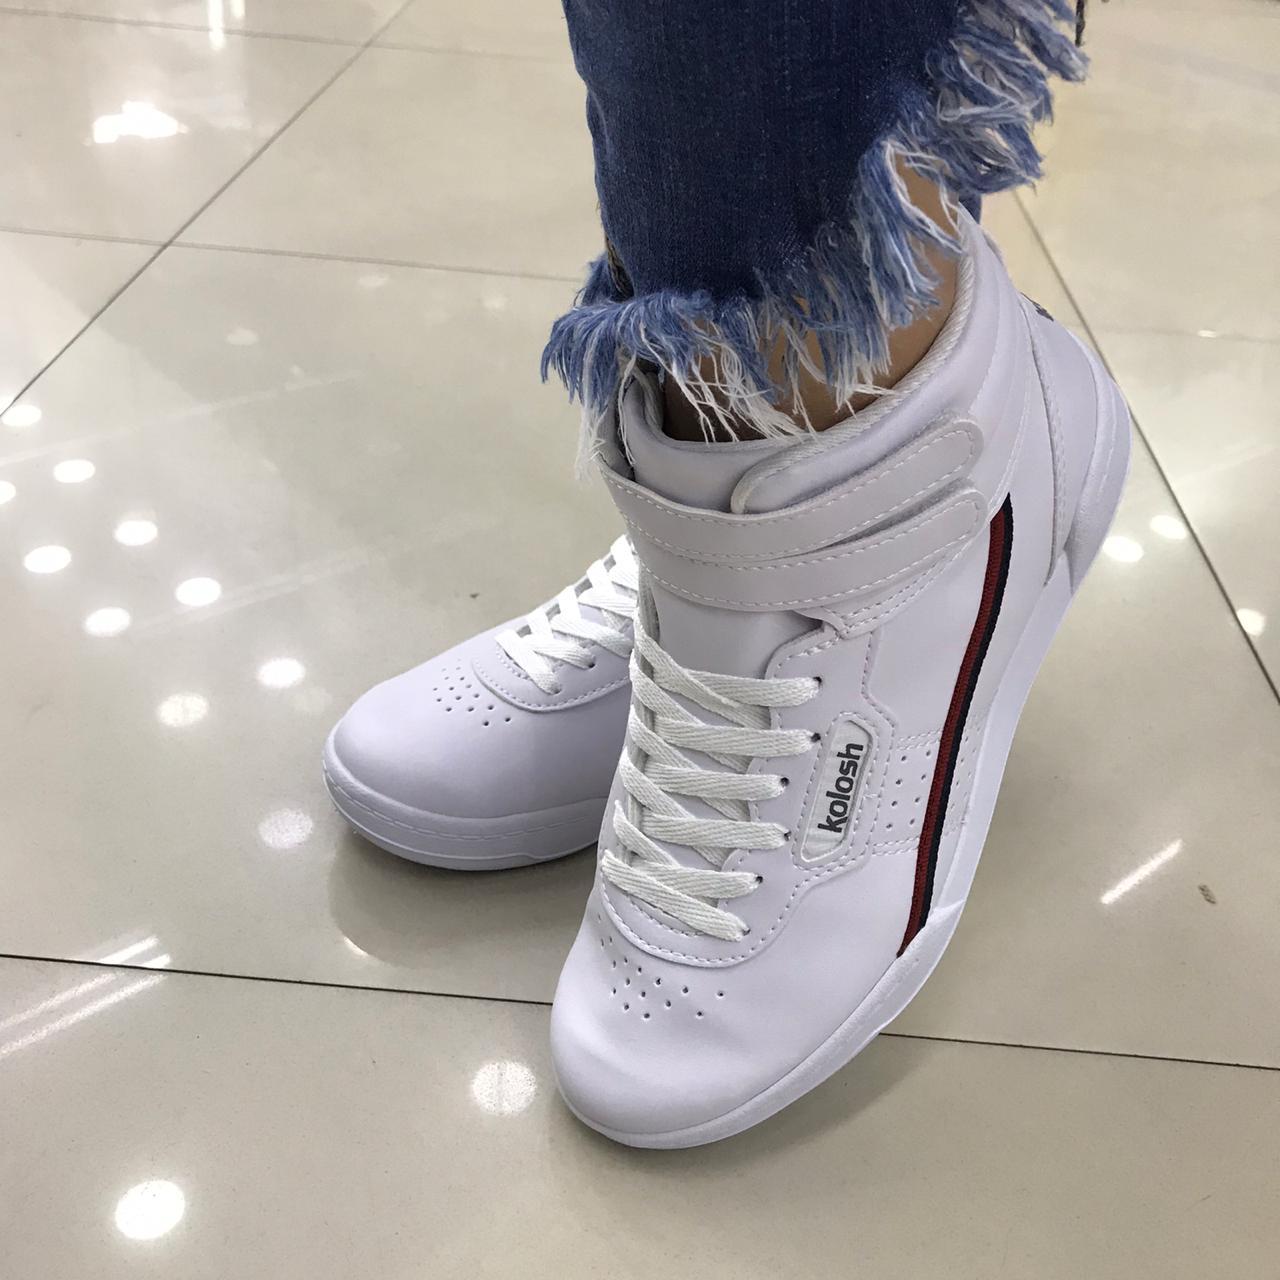 Tênis Kolosh Sneaker Cano Alto Bota Velcro C1661 Feminino